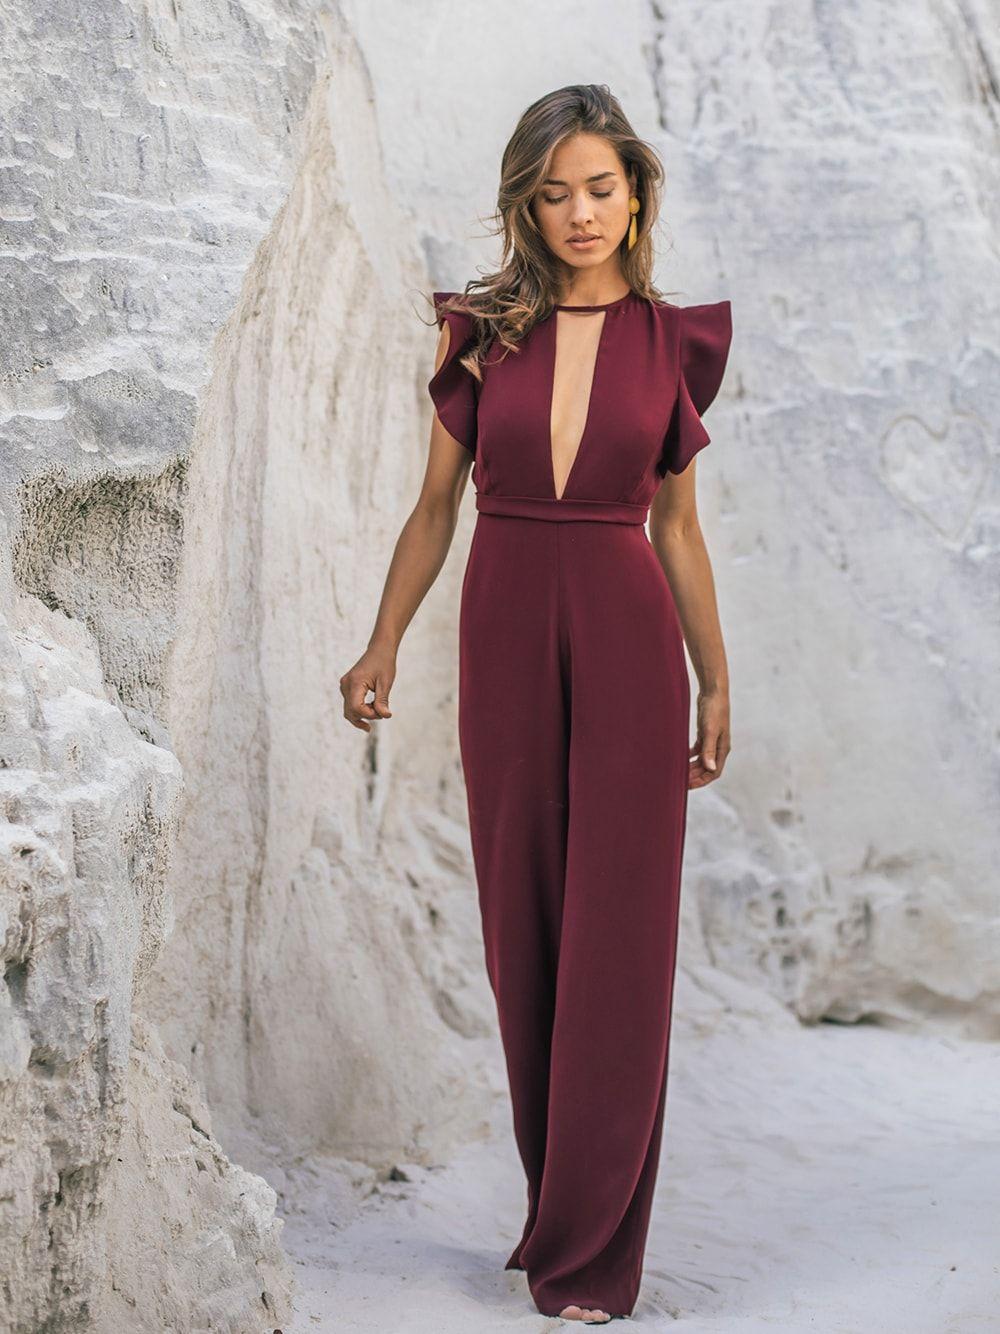 Ruffled burgundy jumpsuit | Kaoâ